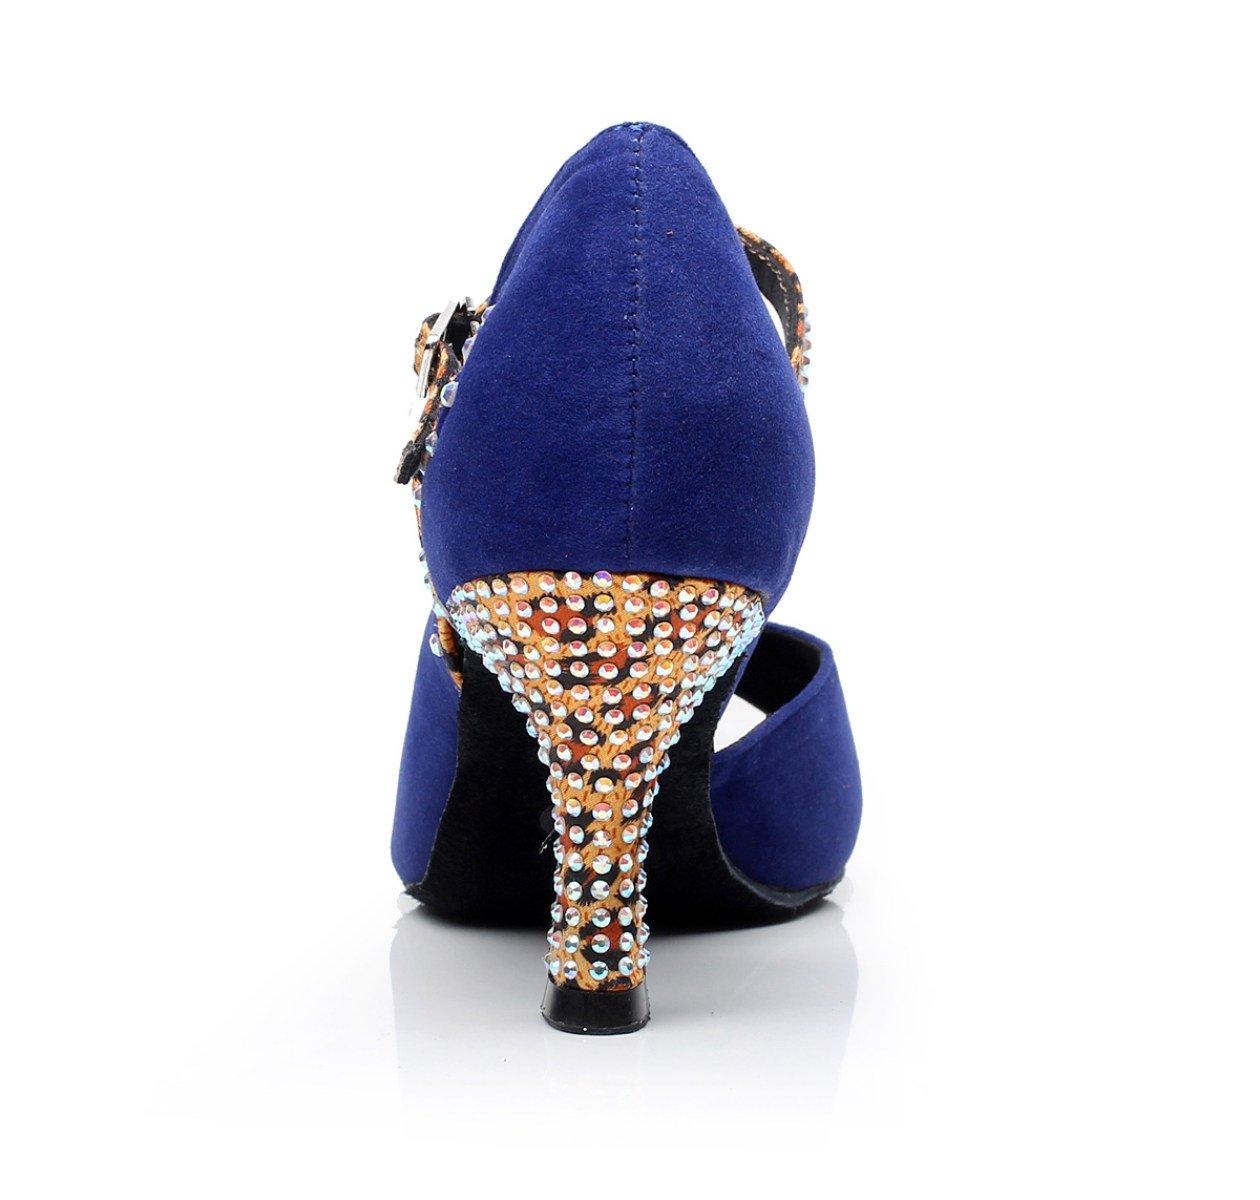 JSHOE Damenschuhe Salsa Tango Ballsaal Latin Dance Dance Dance Schuhe Party Tanzschuhe,Blau-heeled7.5cm-UK3.5/EU34/Our35 - 63a8dd